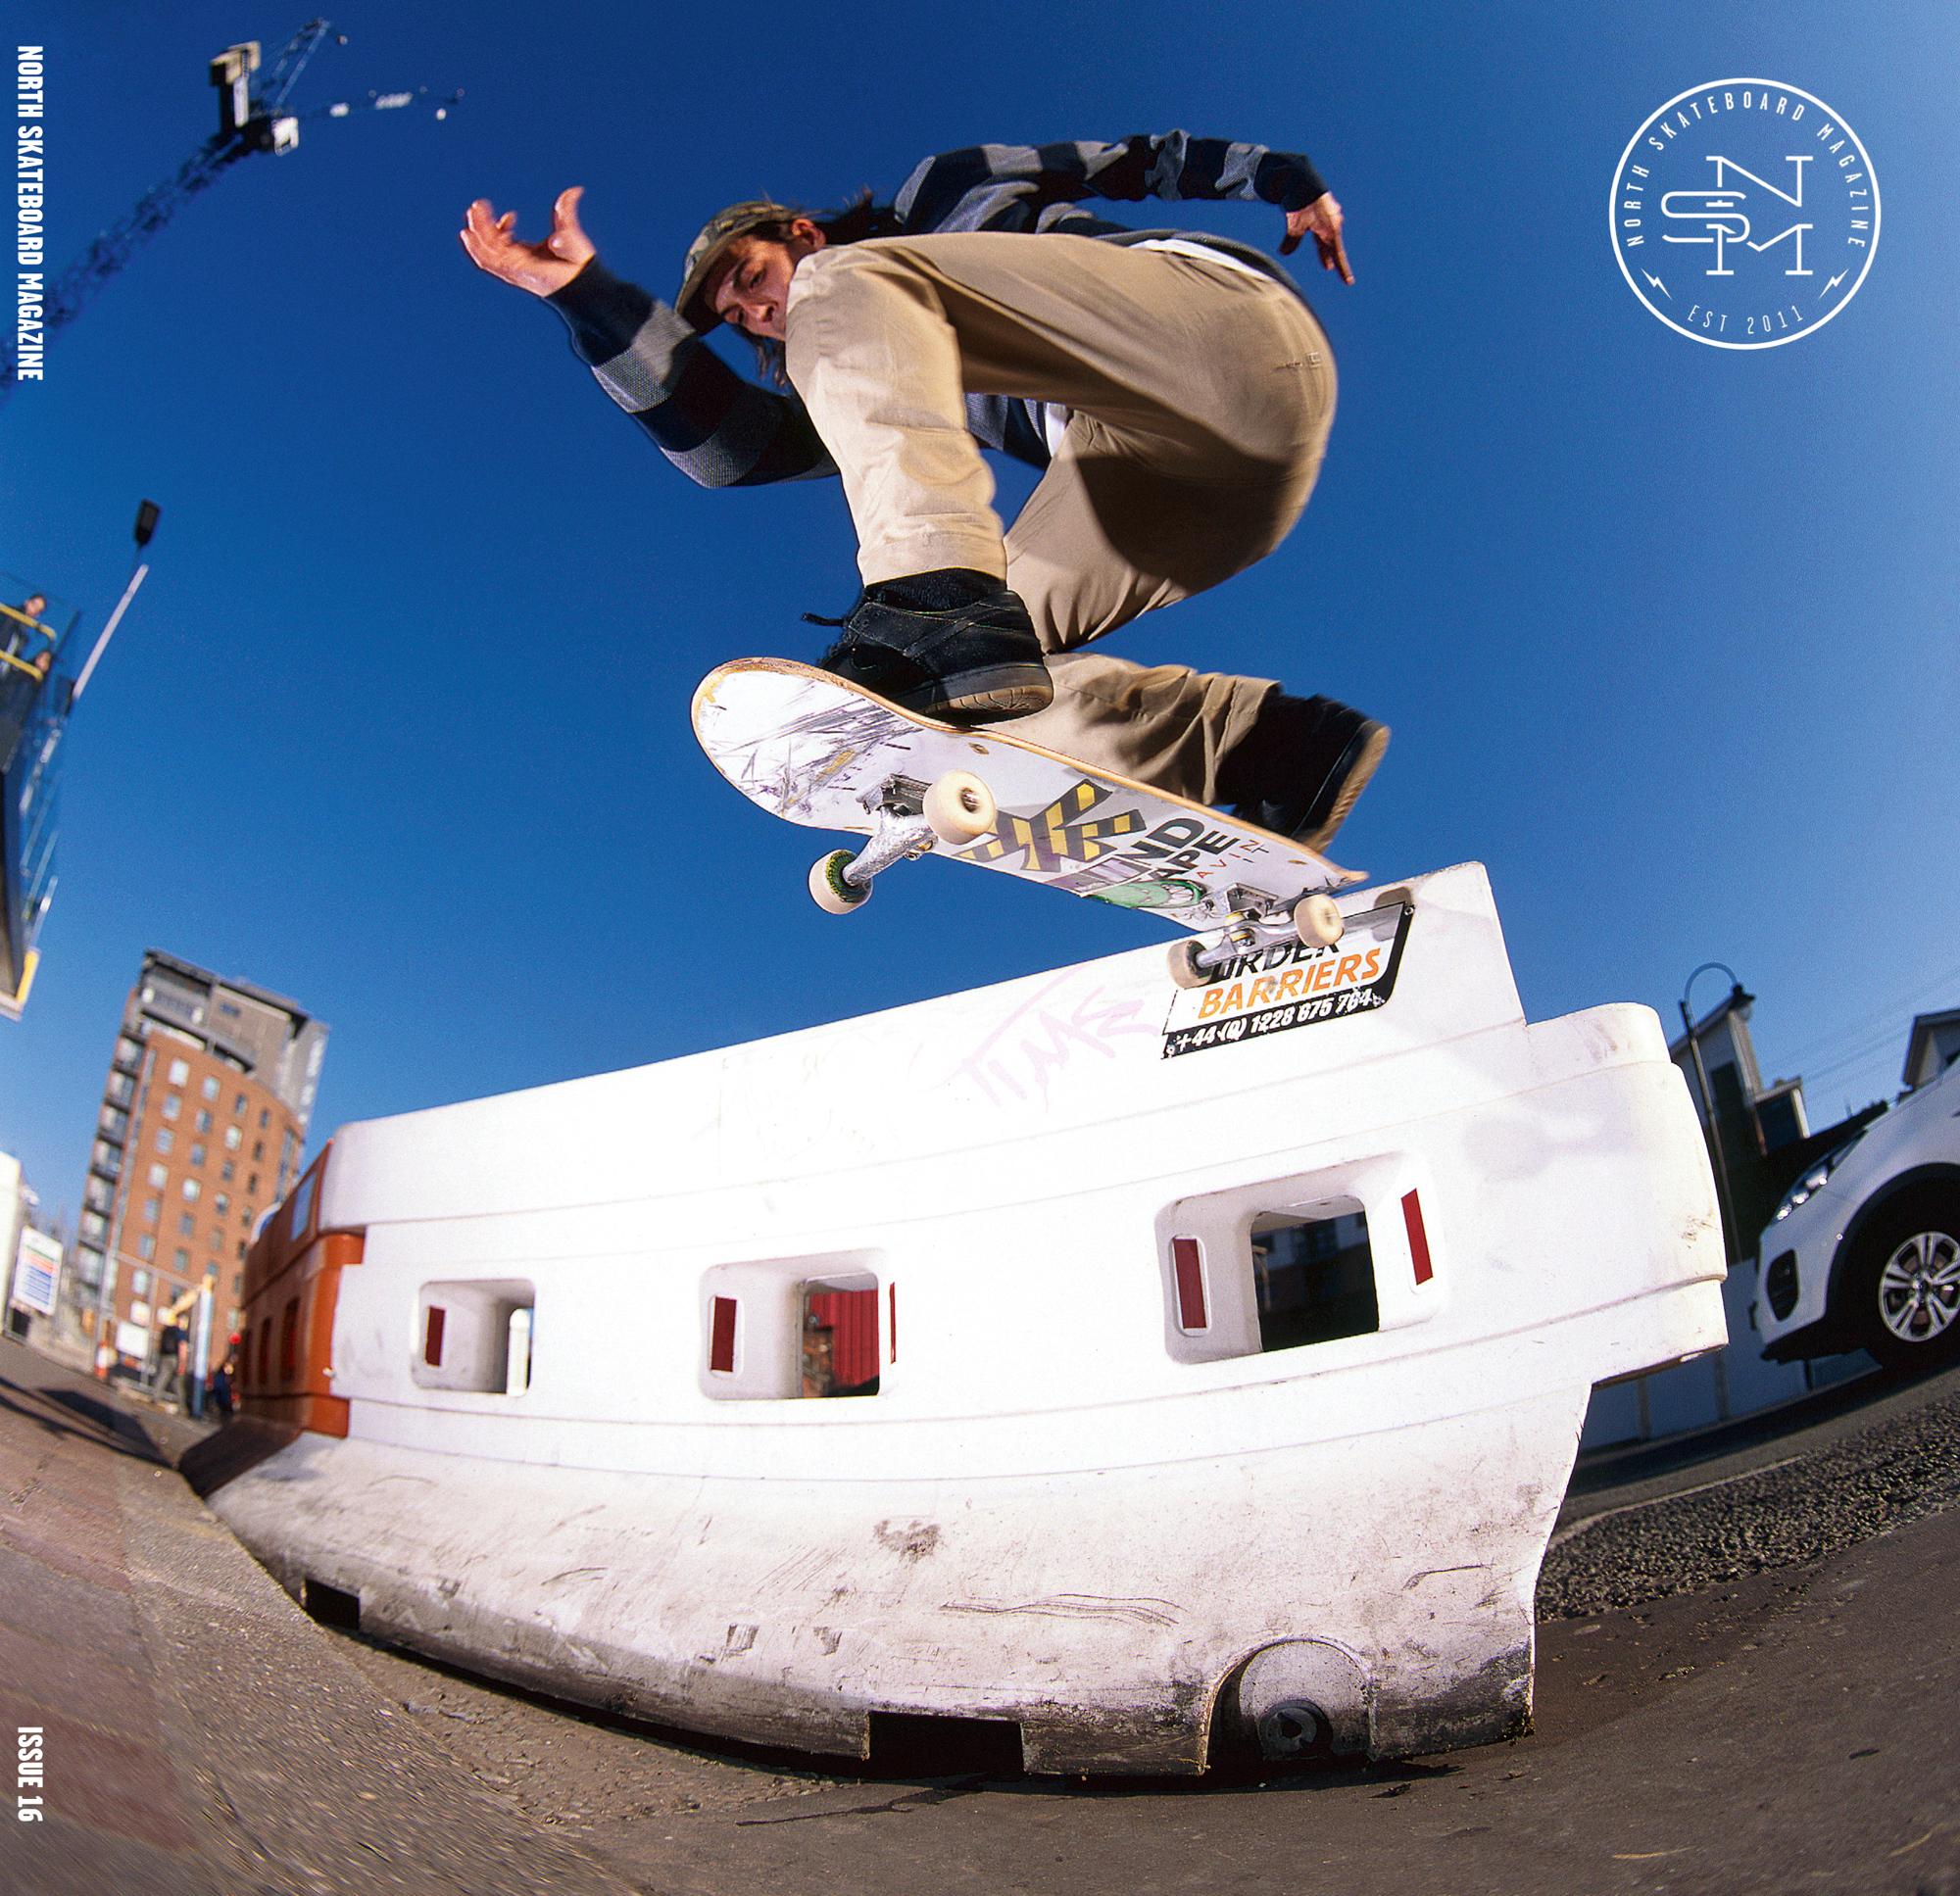 Cover: Joe Gavin - Nollie BS Tailslide  Photo: Graham Tait